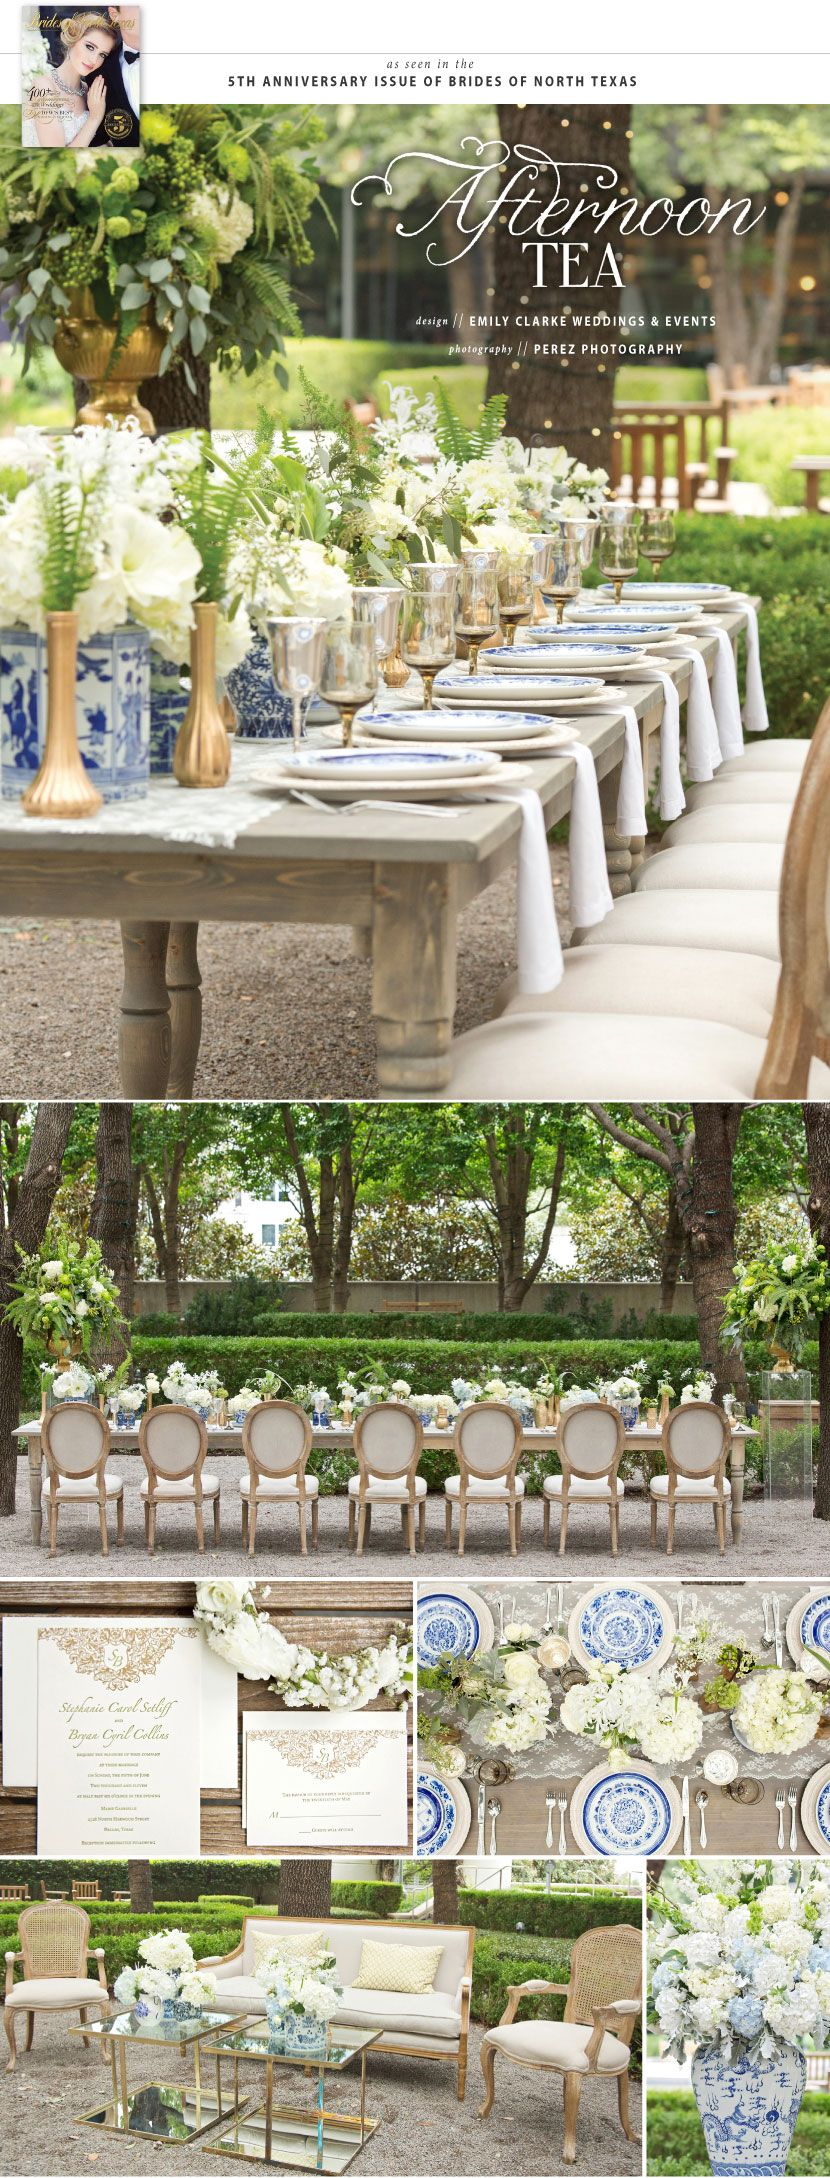 Afternoon Tea | Wedding Inspiration | Brides of North Texas